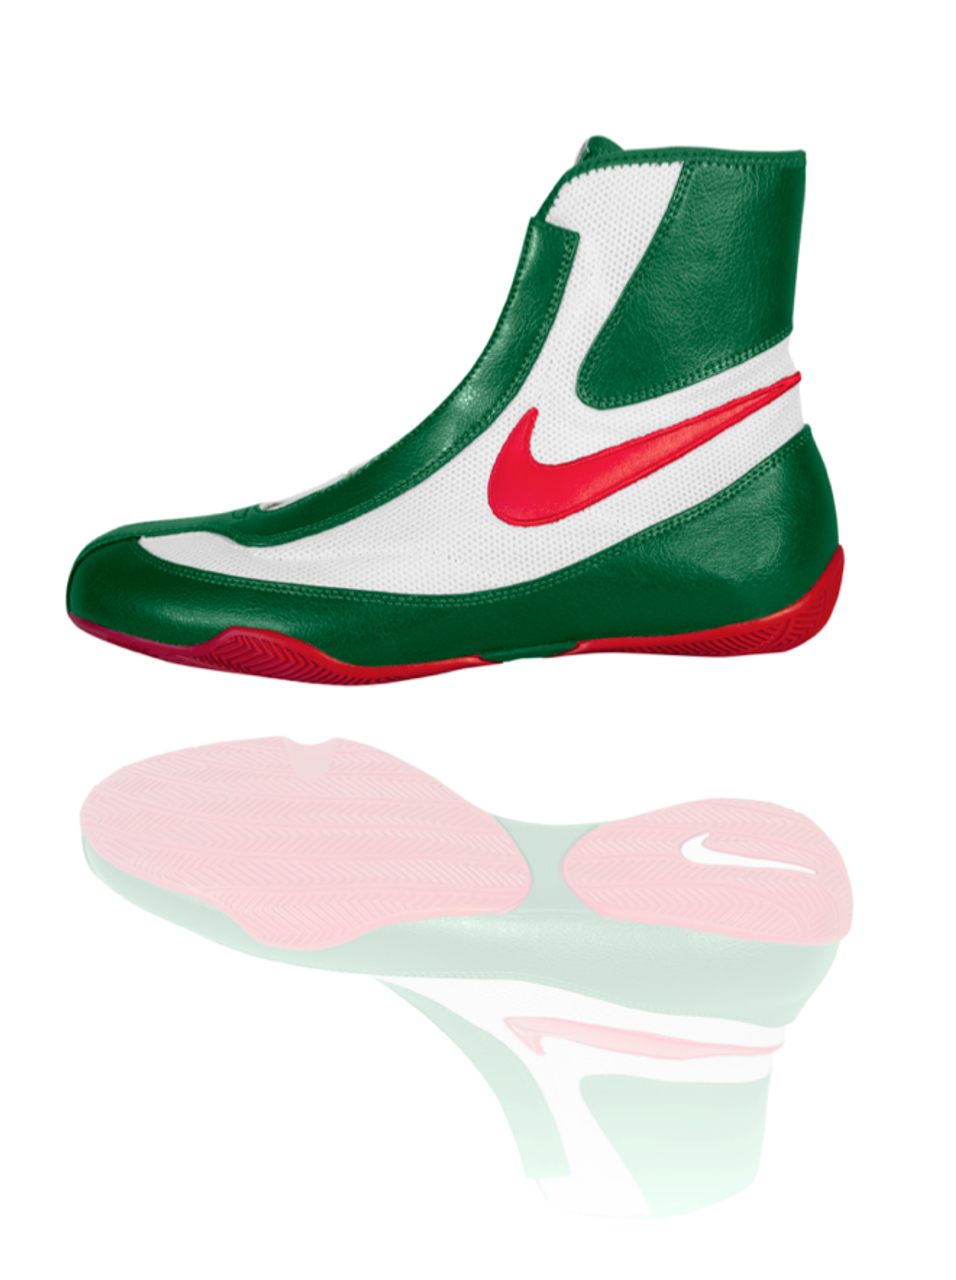 04e1056920e NIKE Machomai MID TOP Boxing Shoes - Green   White   Red Color - PROGEAR